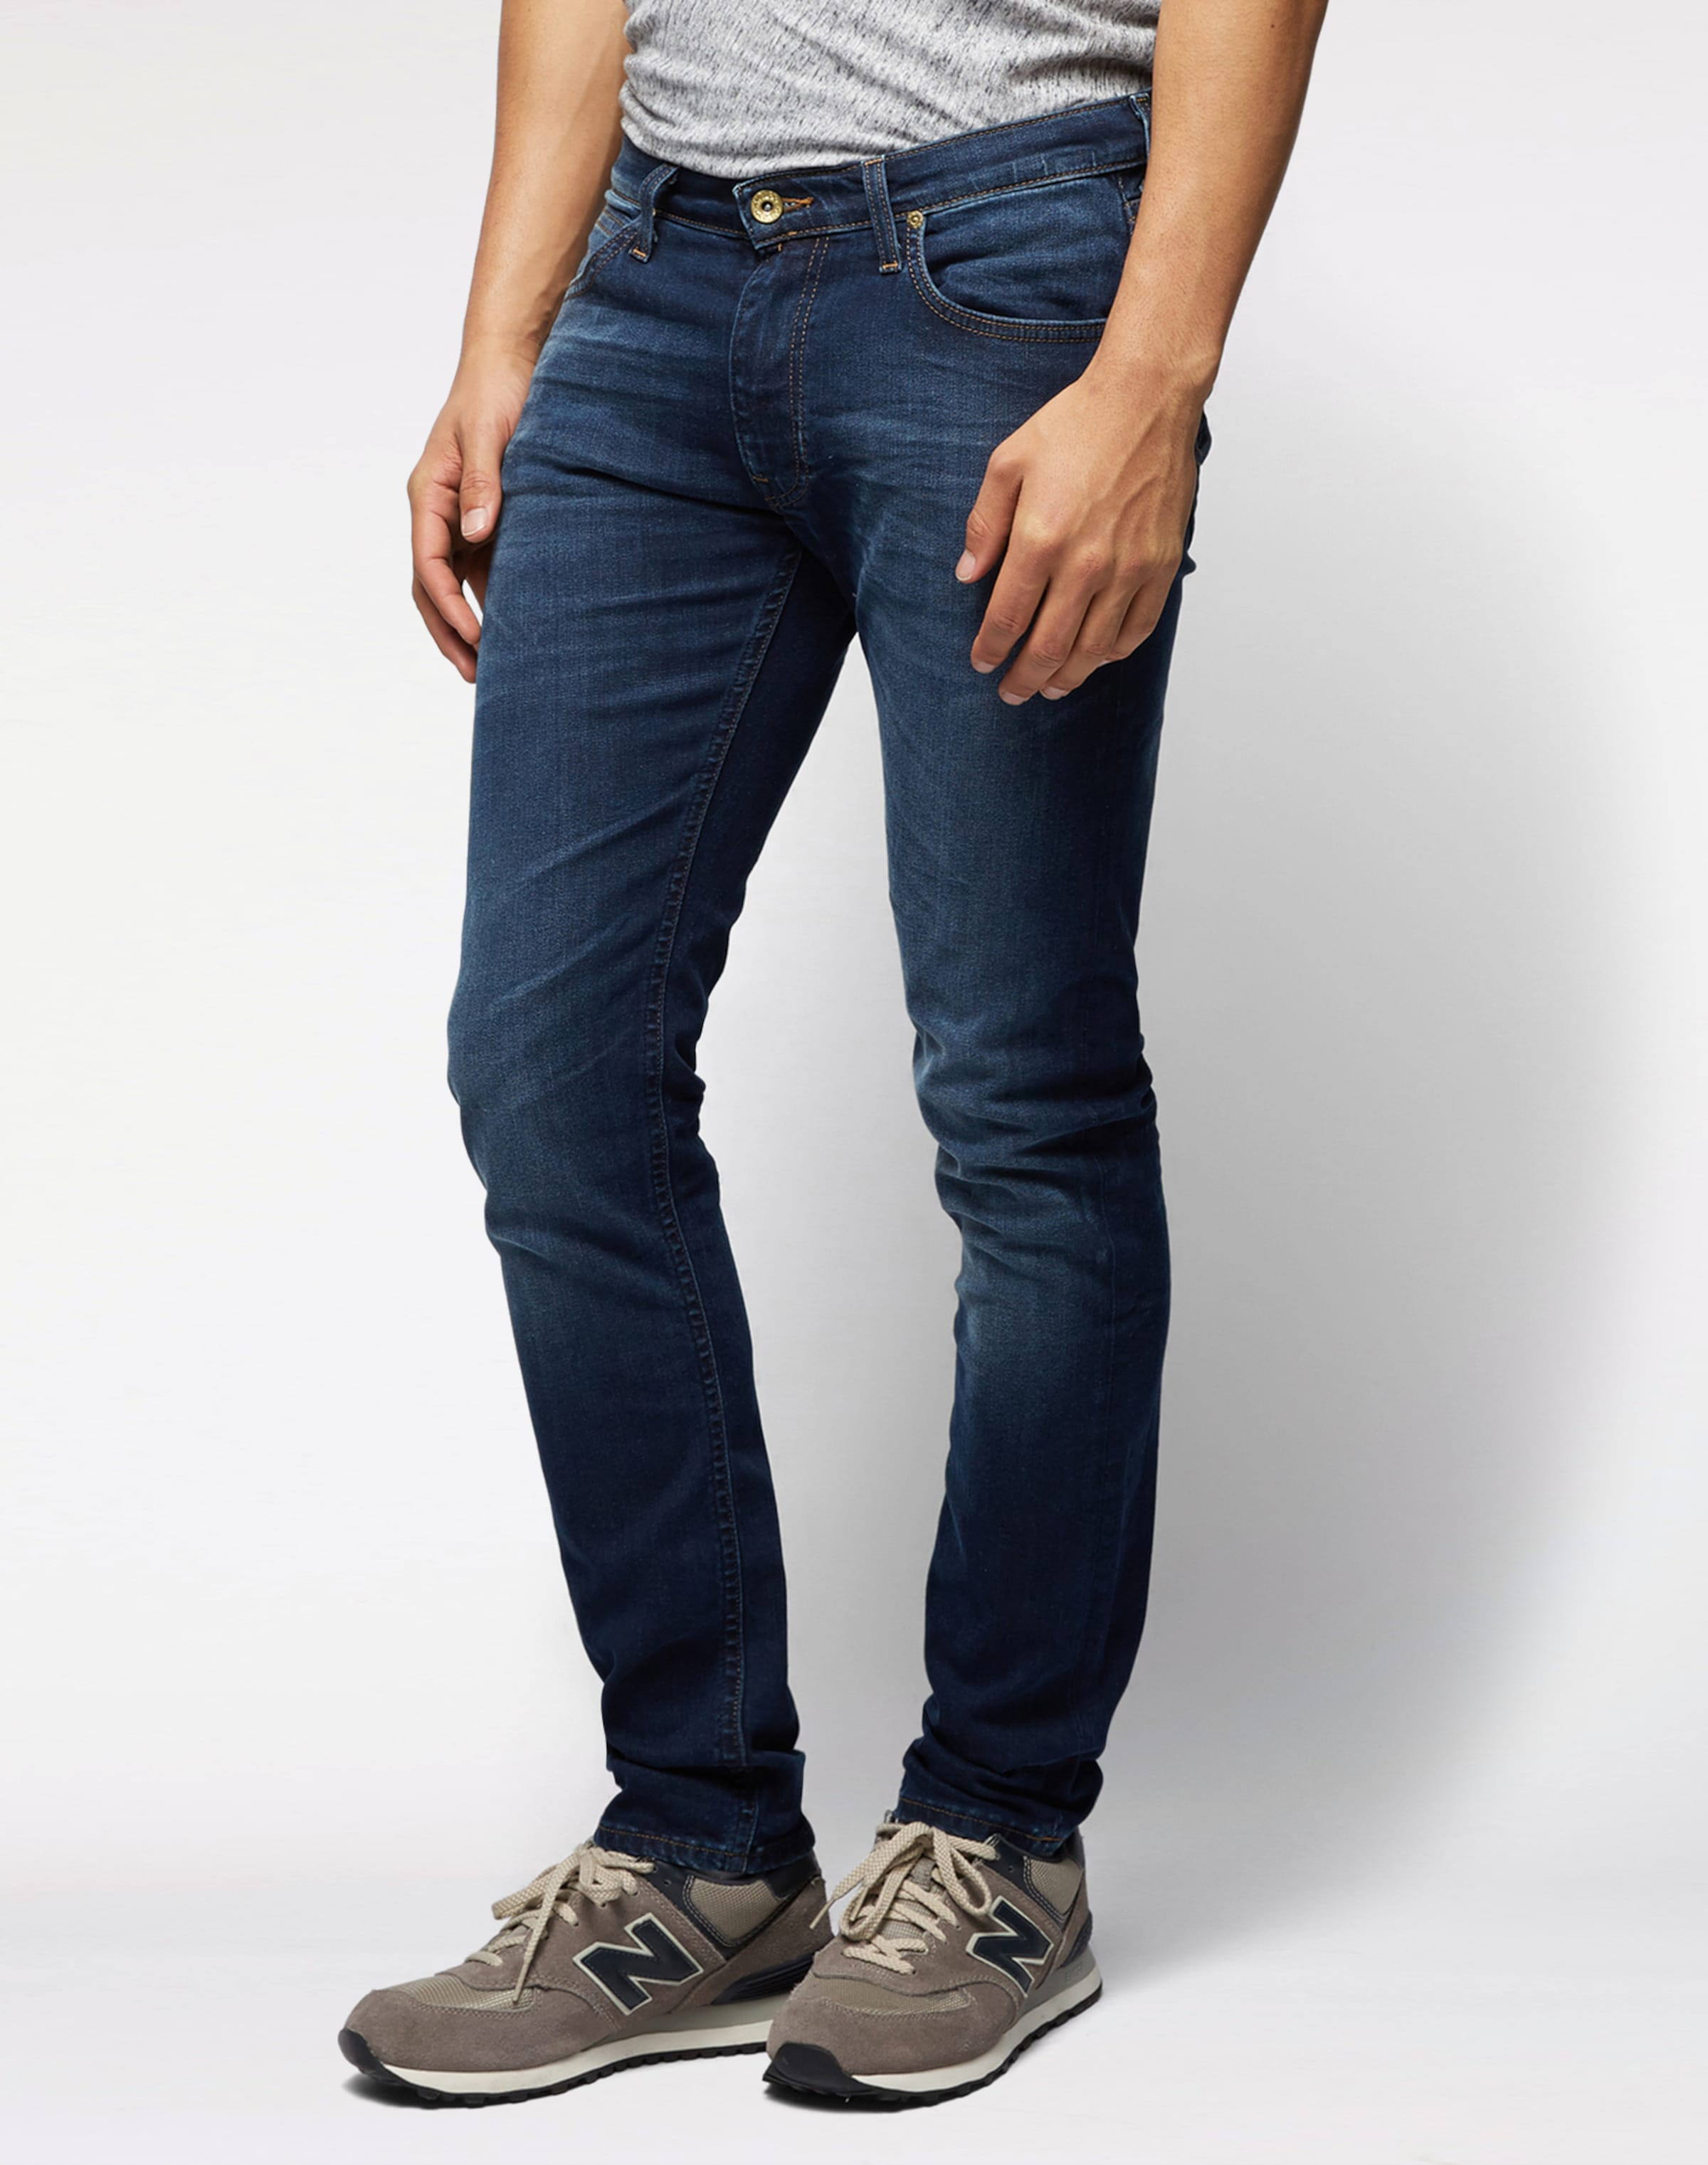 Denim Blue Lee 'luke' Jeans In kXOZPiu